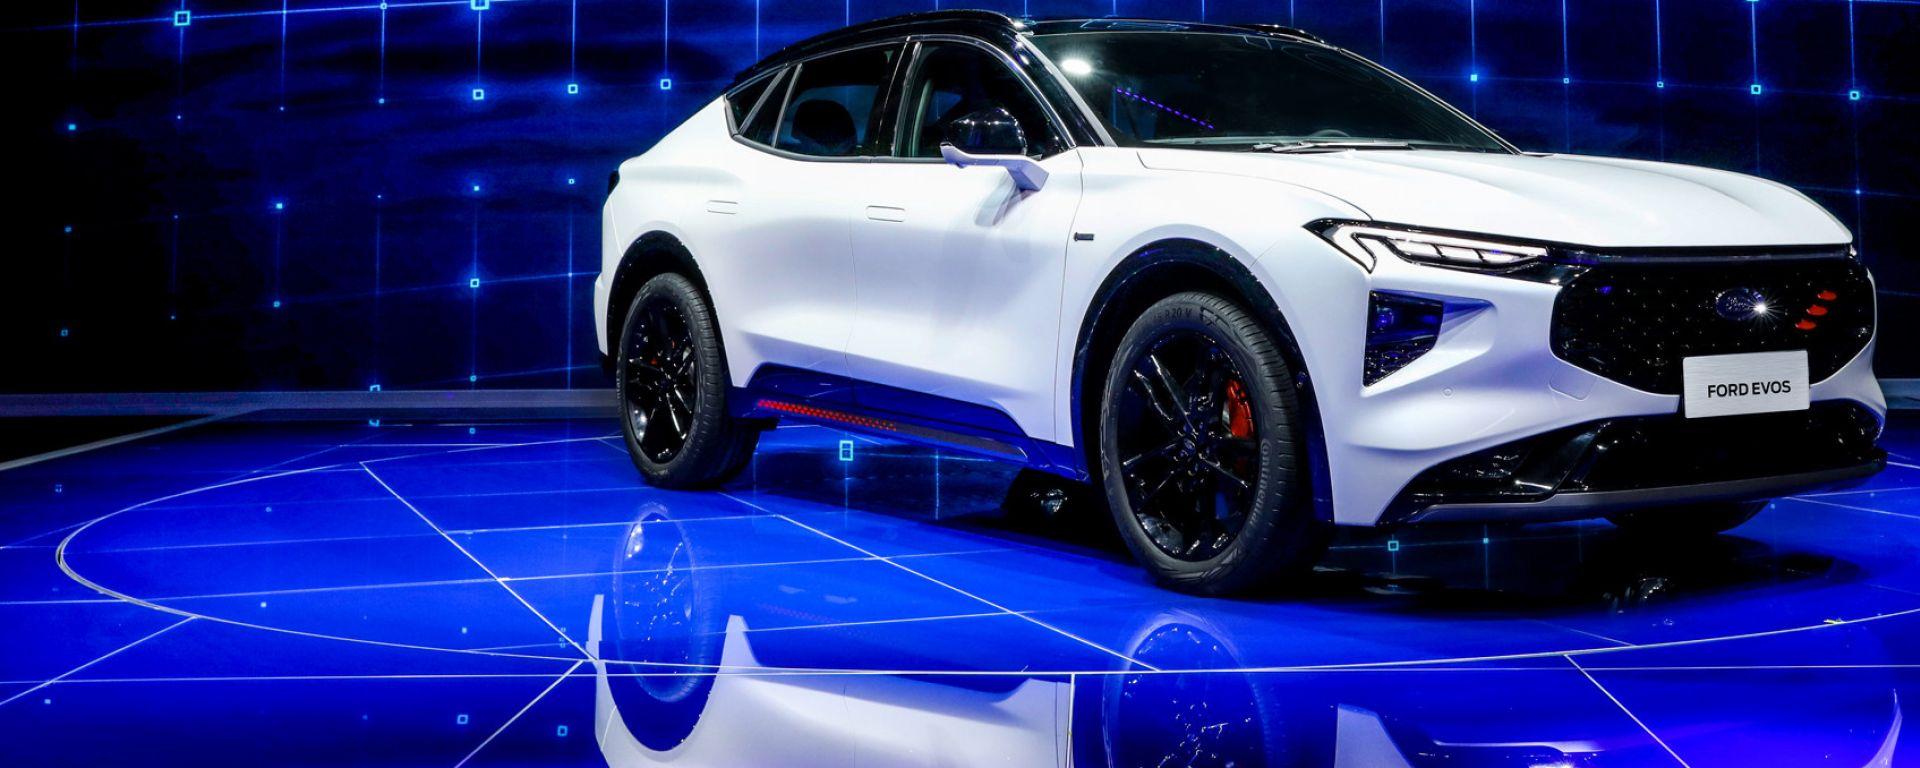 Nuova Ford Evos: leggesi Ford Mondeo SUV coupé?